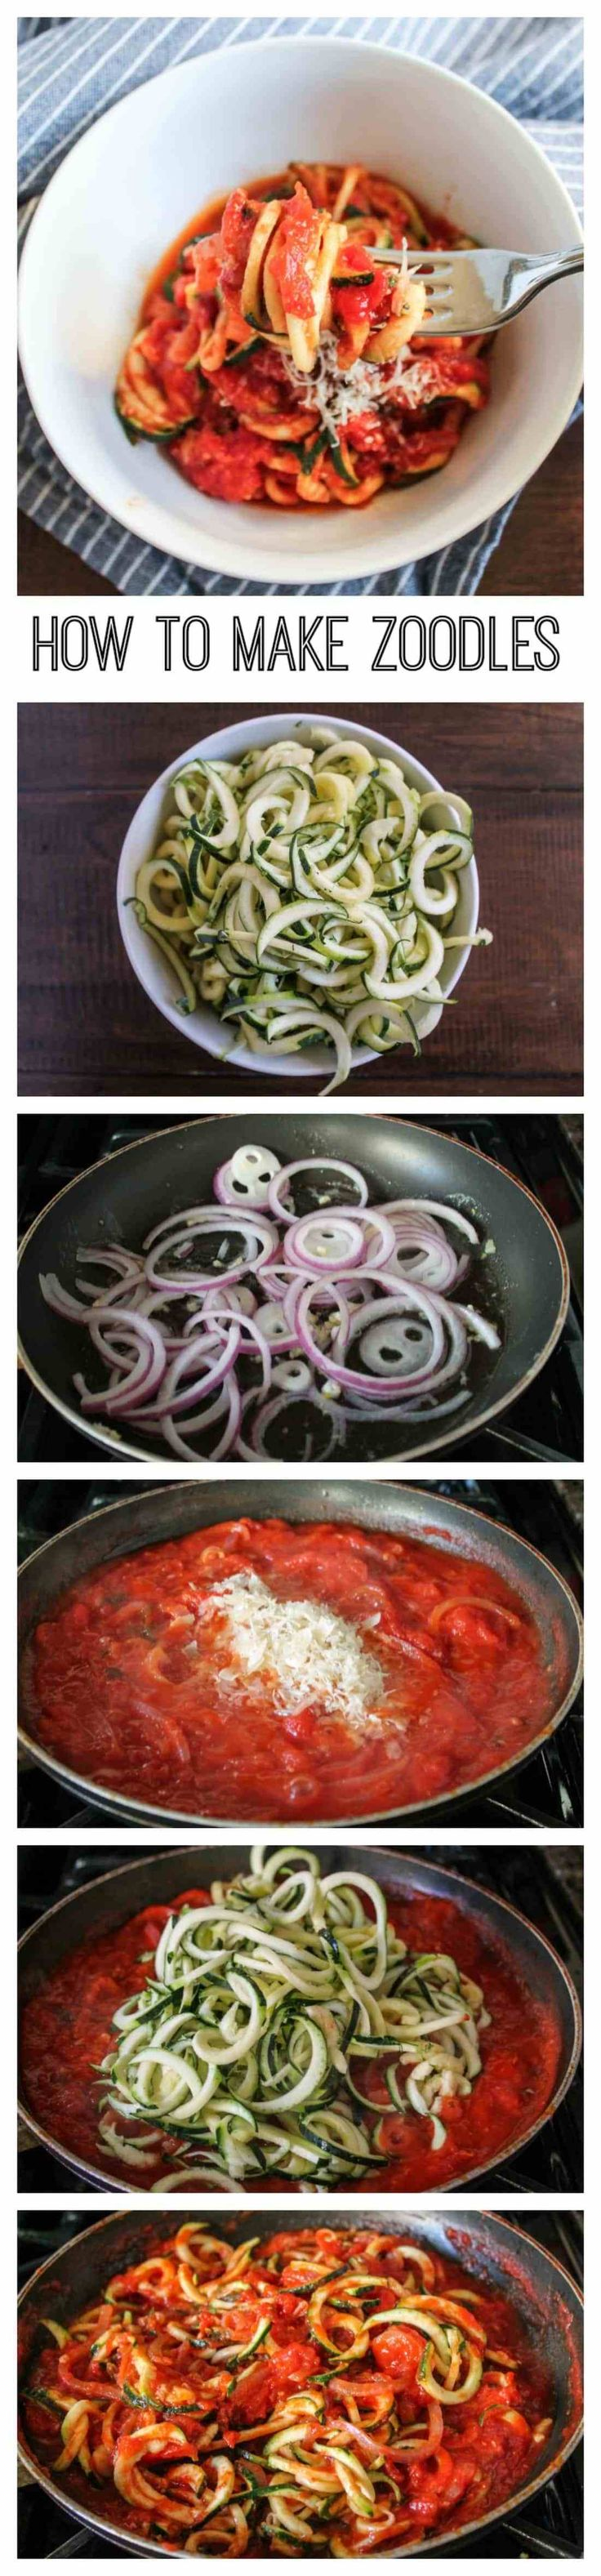 How to Make Zoodles - Zucchini Pasta via The Kittchen